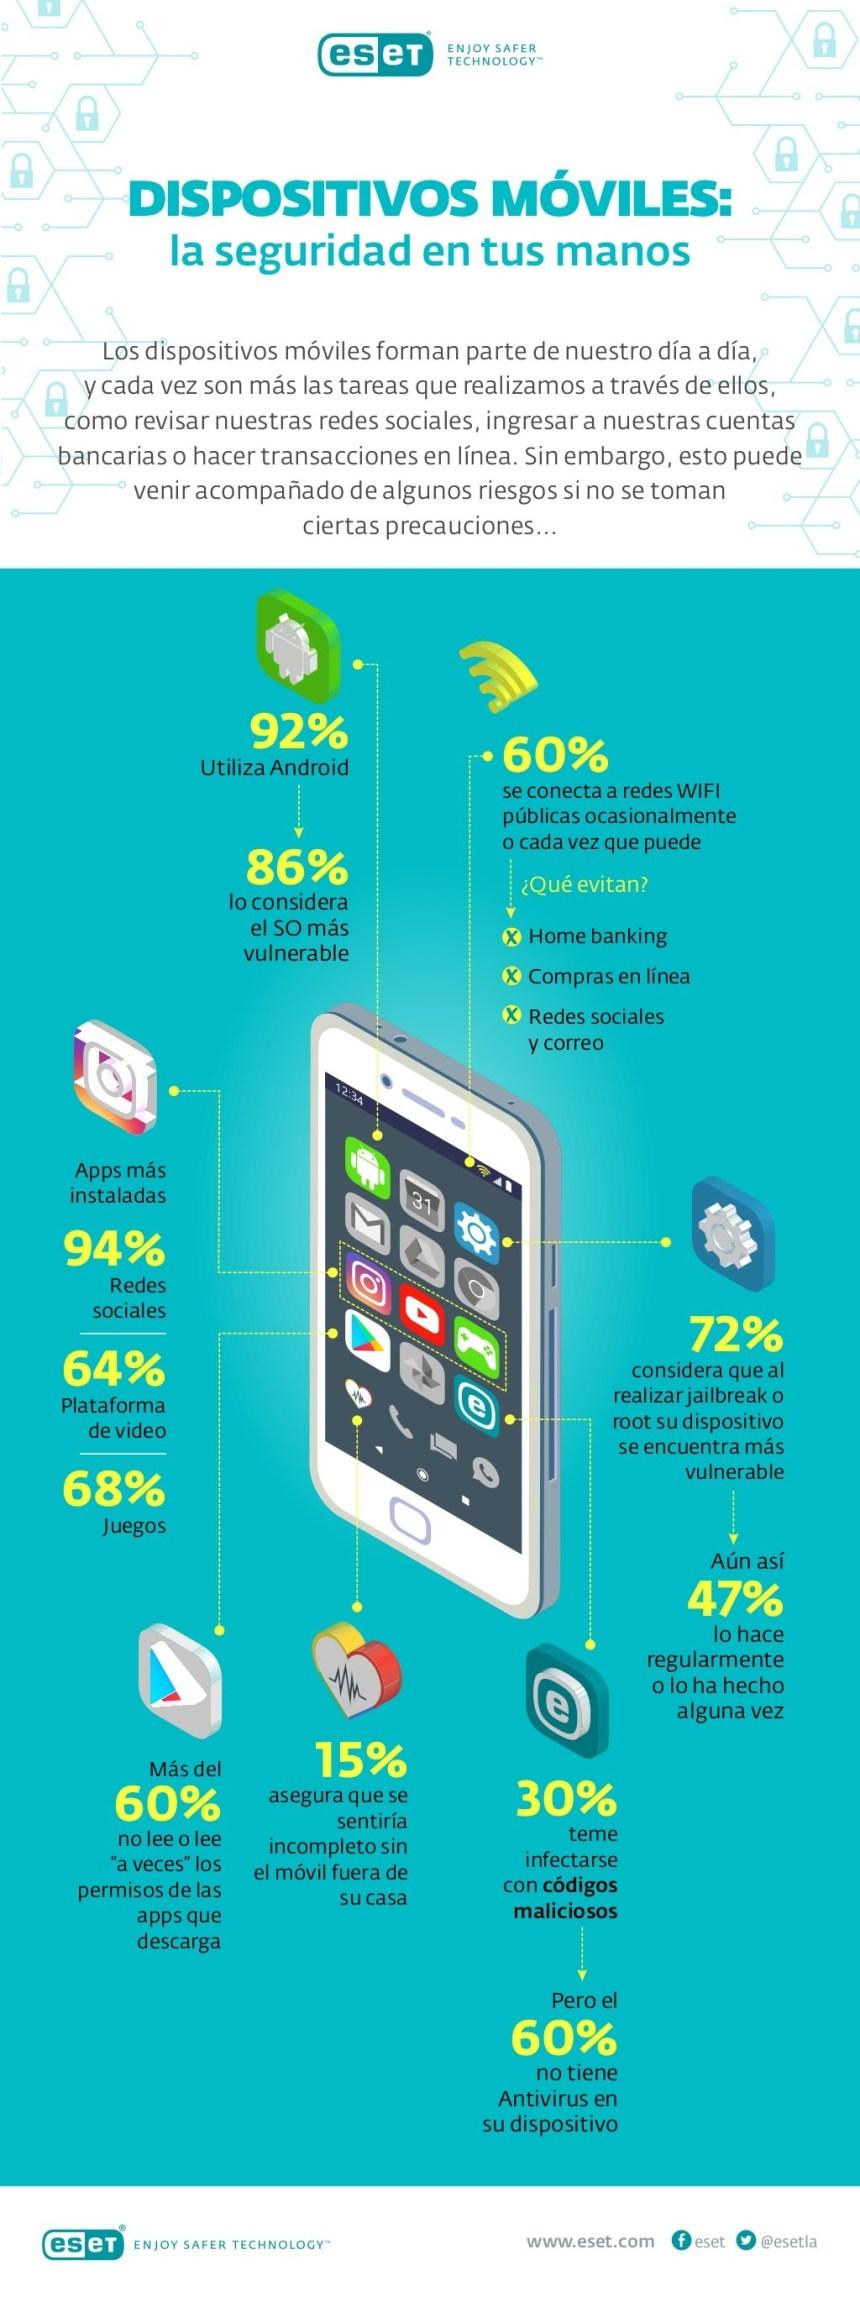 Seguridad en dispositivos móviles #infografia #infographic